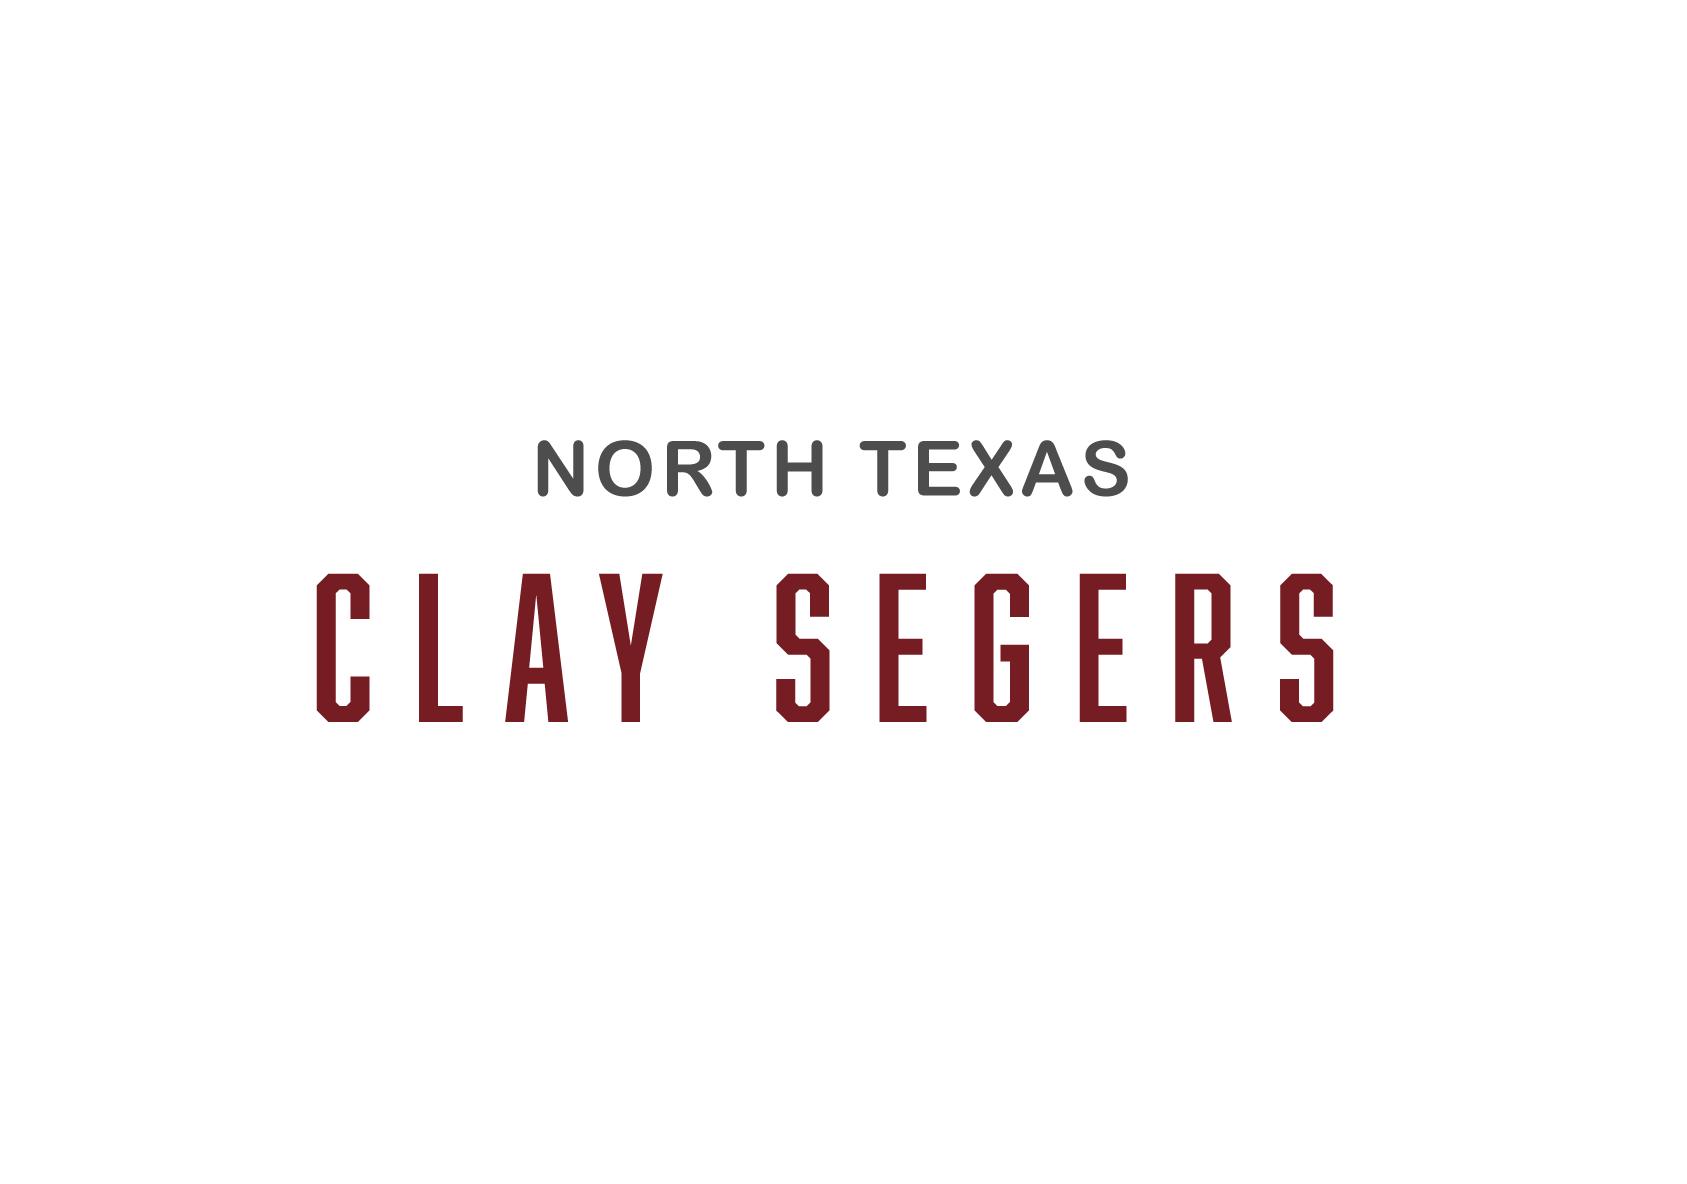 claysegars_n.png